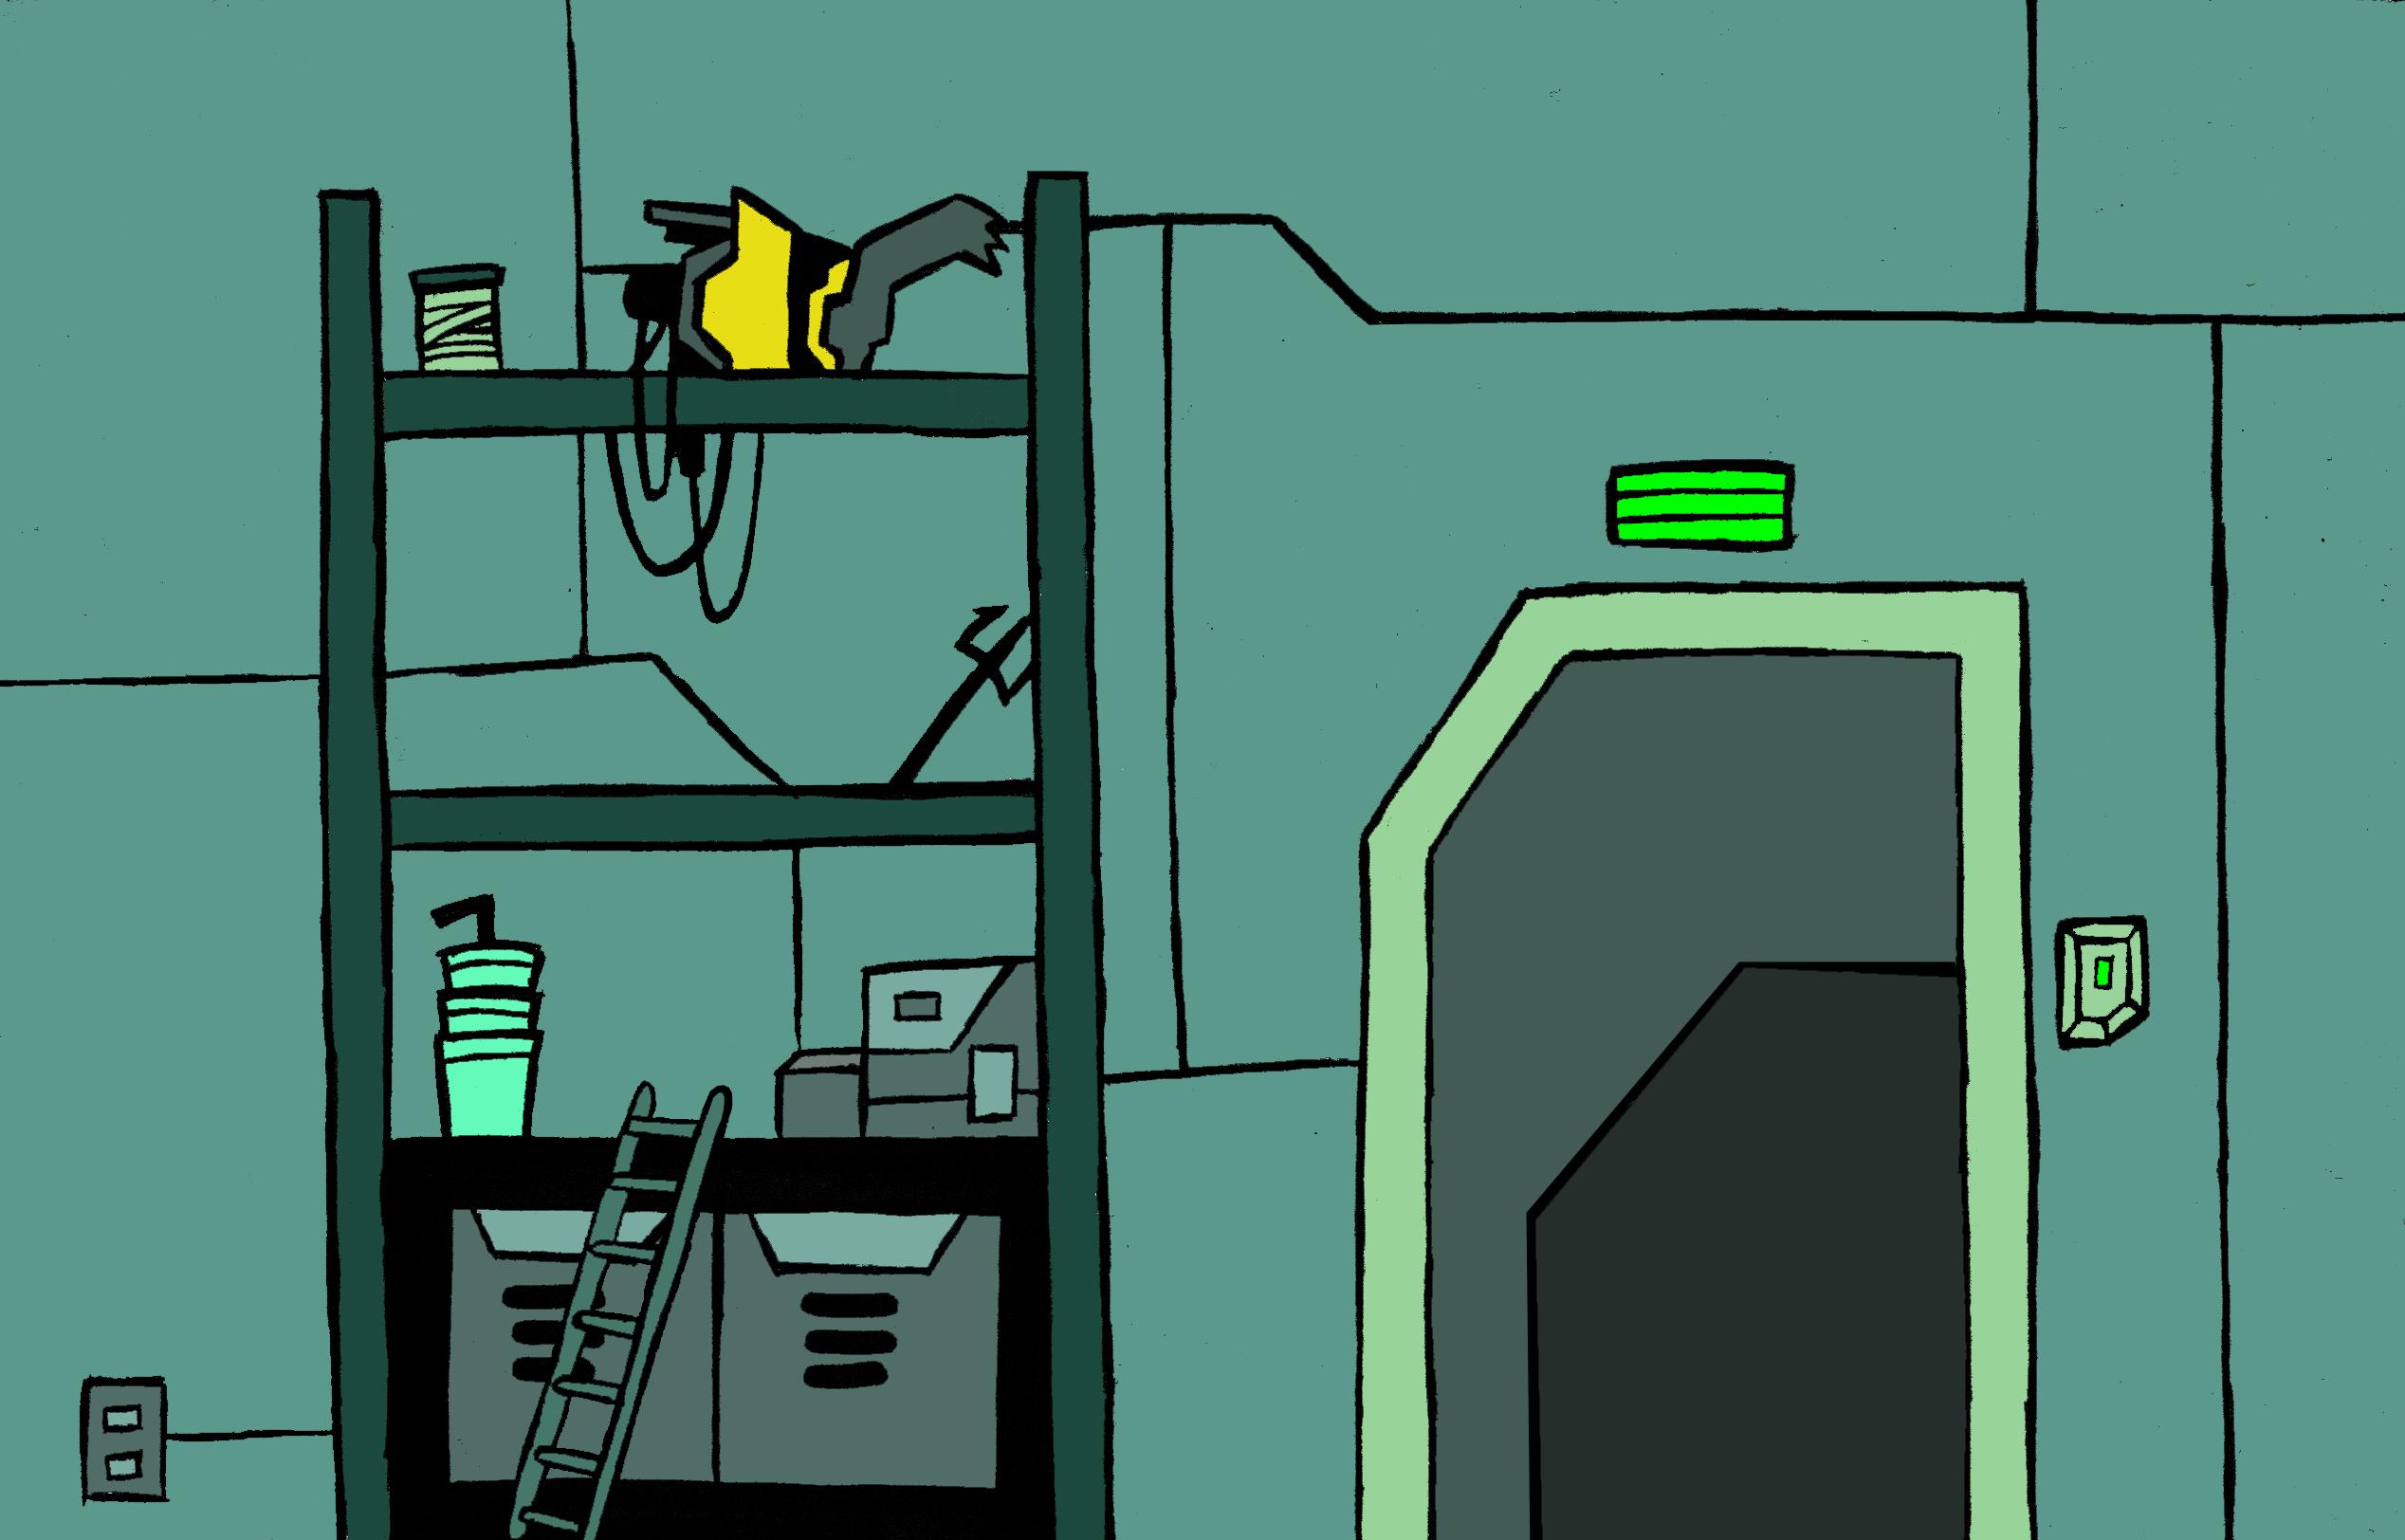 Plumber Lab Background 1